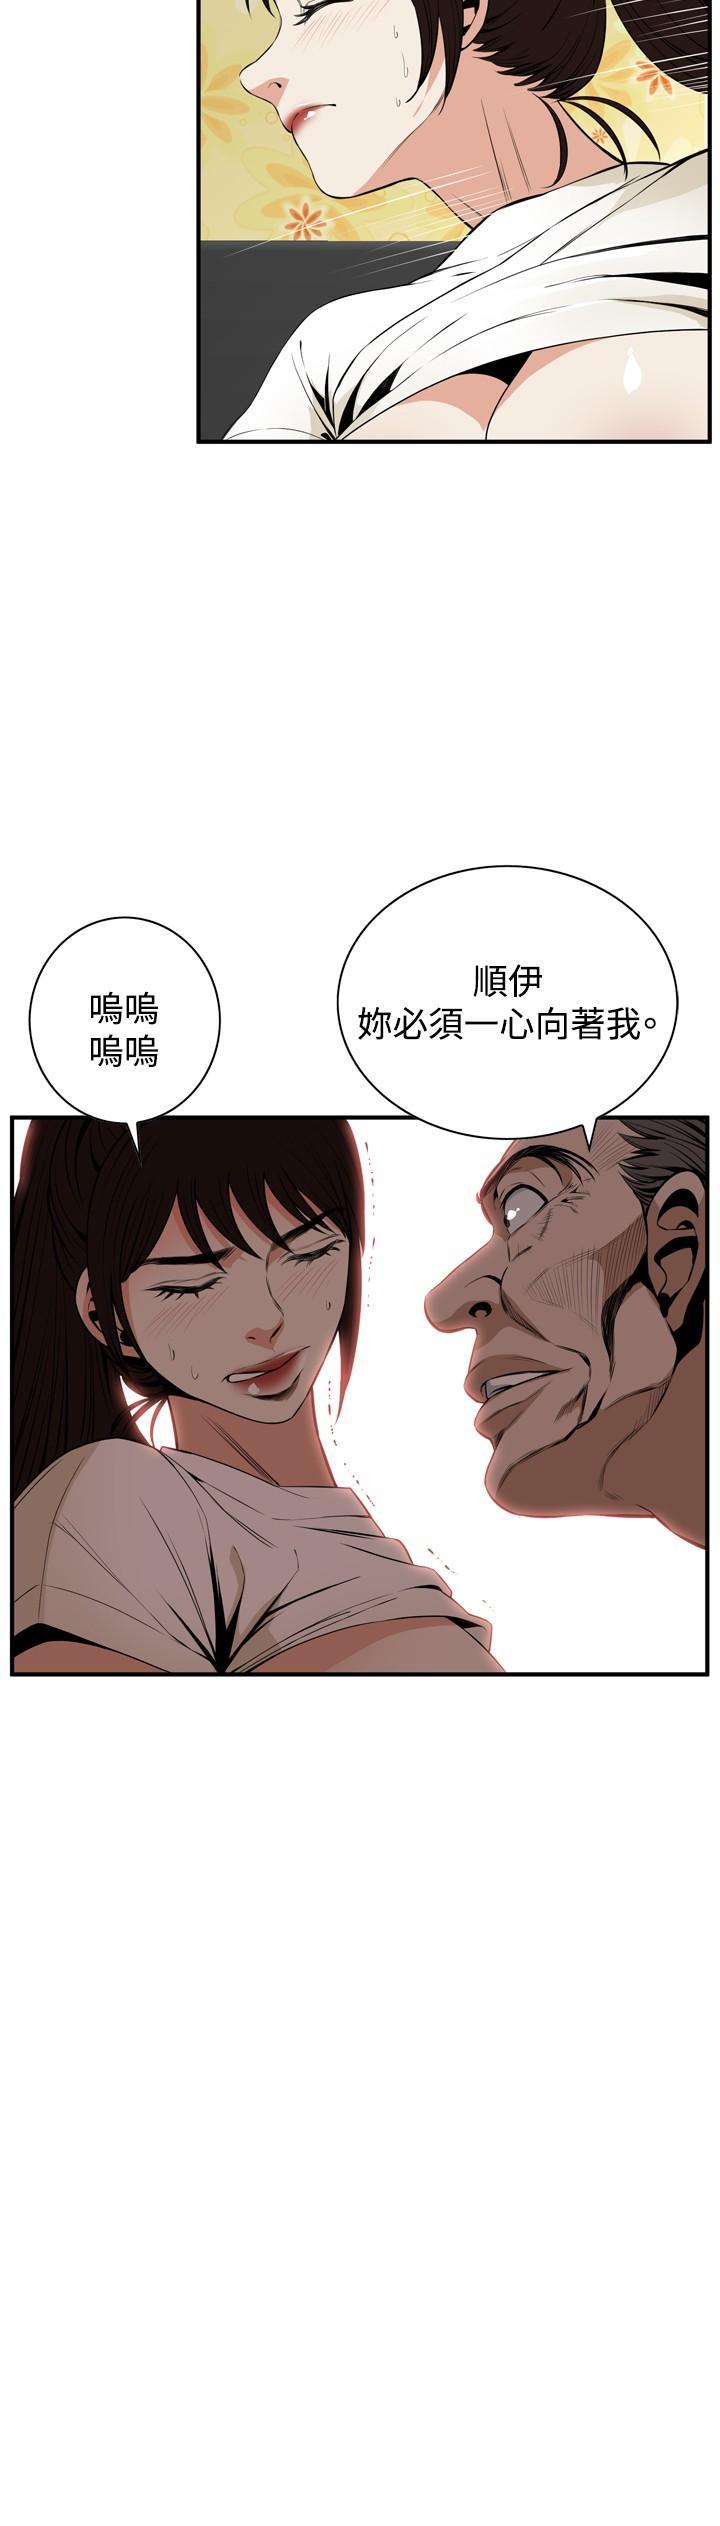 Take a Peek 偷窥 Ch.39~55 [Chinese]中文 9